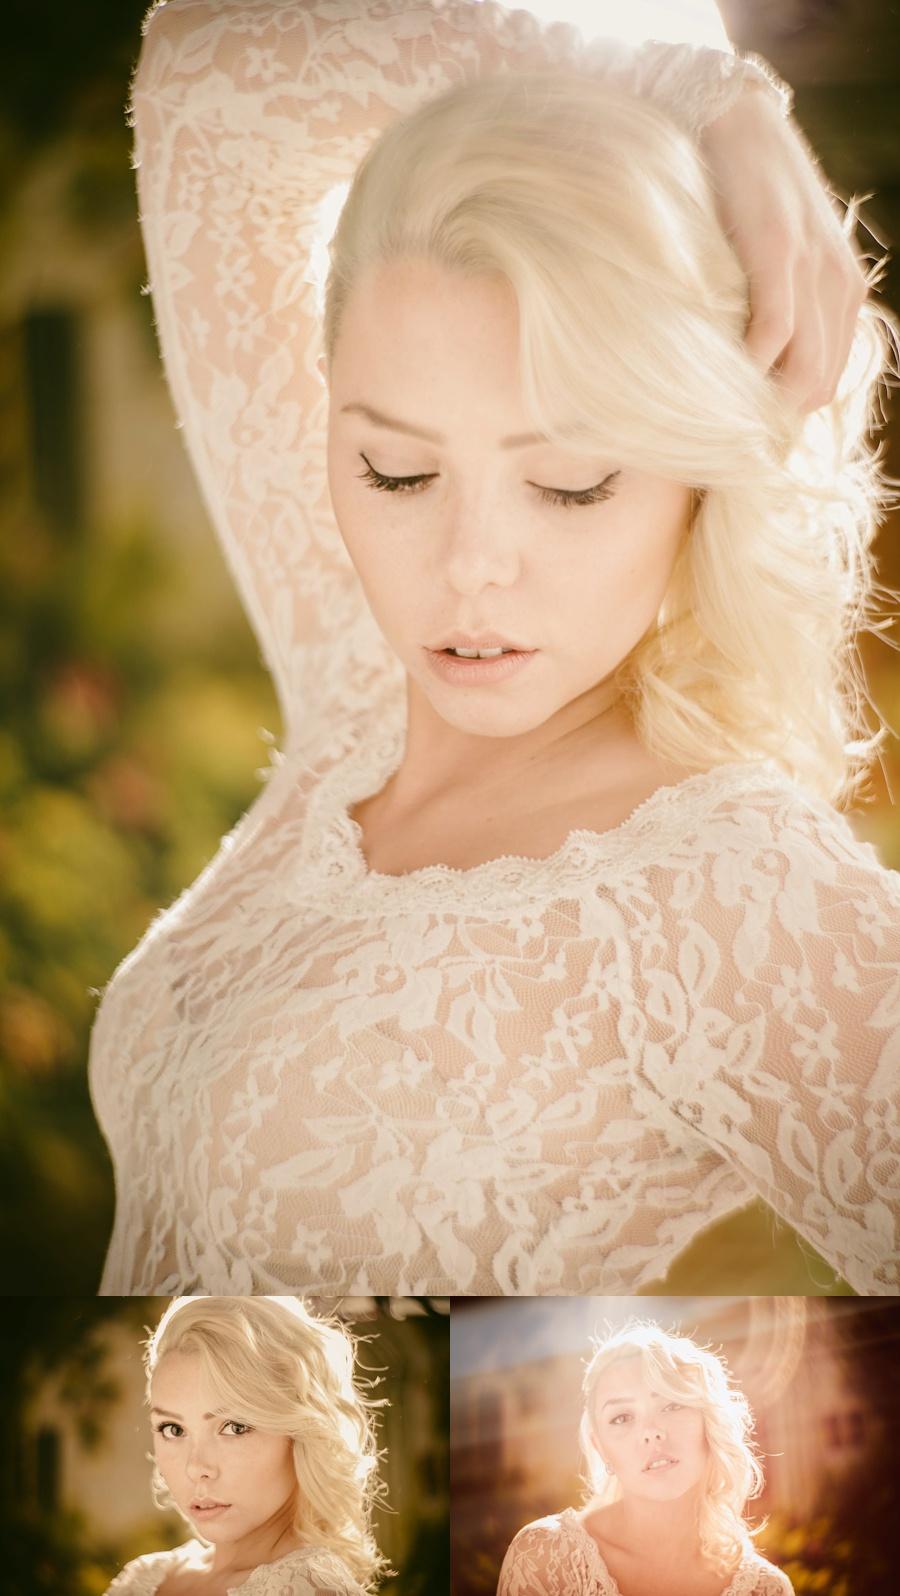 Jya_Rose_by_Ian_McCausland-23